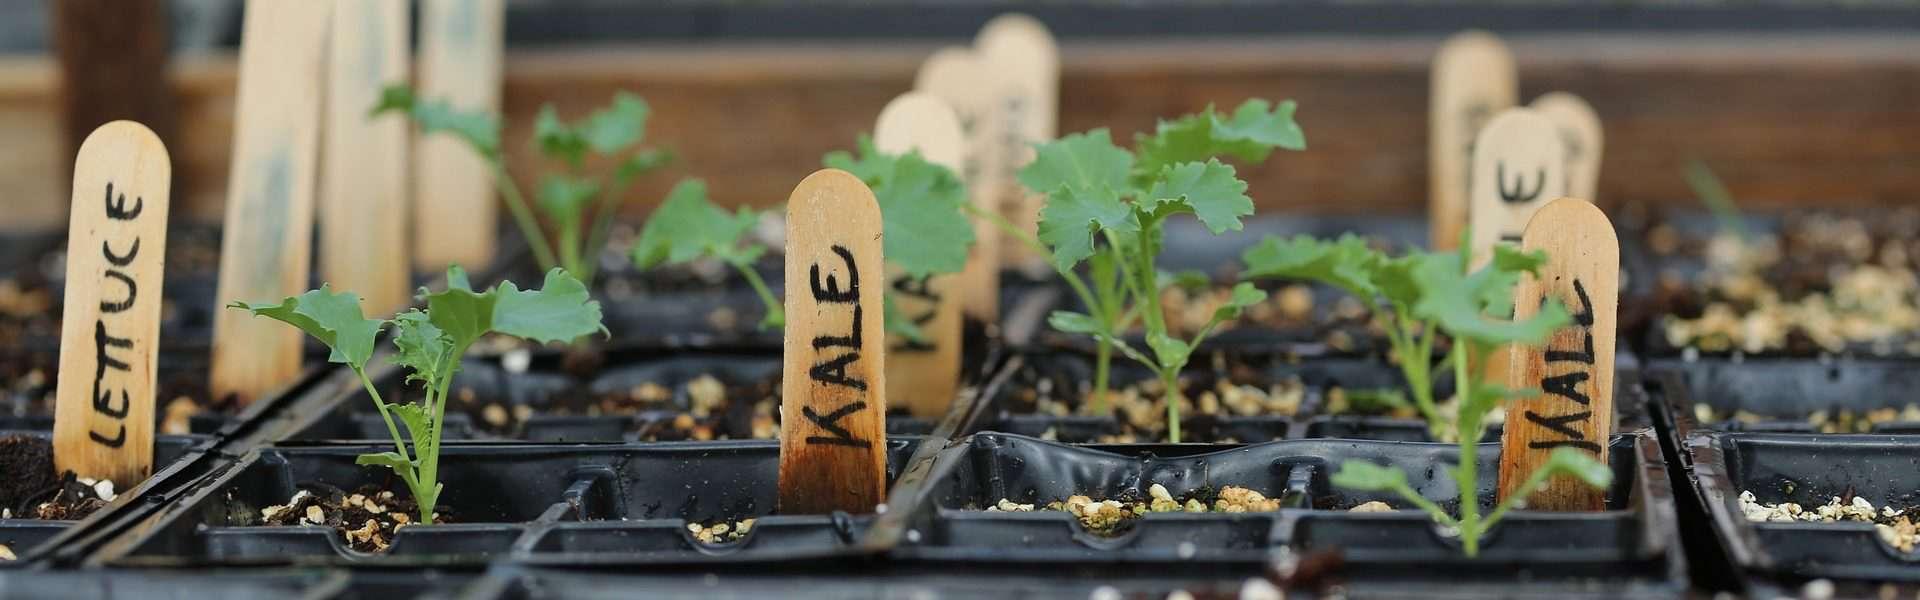 kale and lettuce seedlings